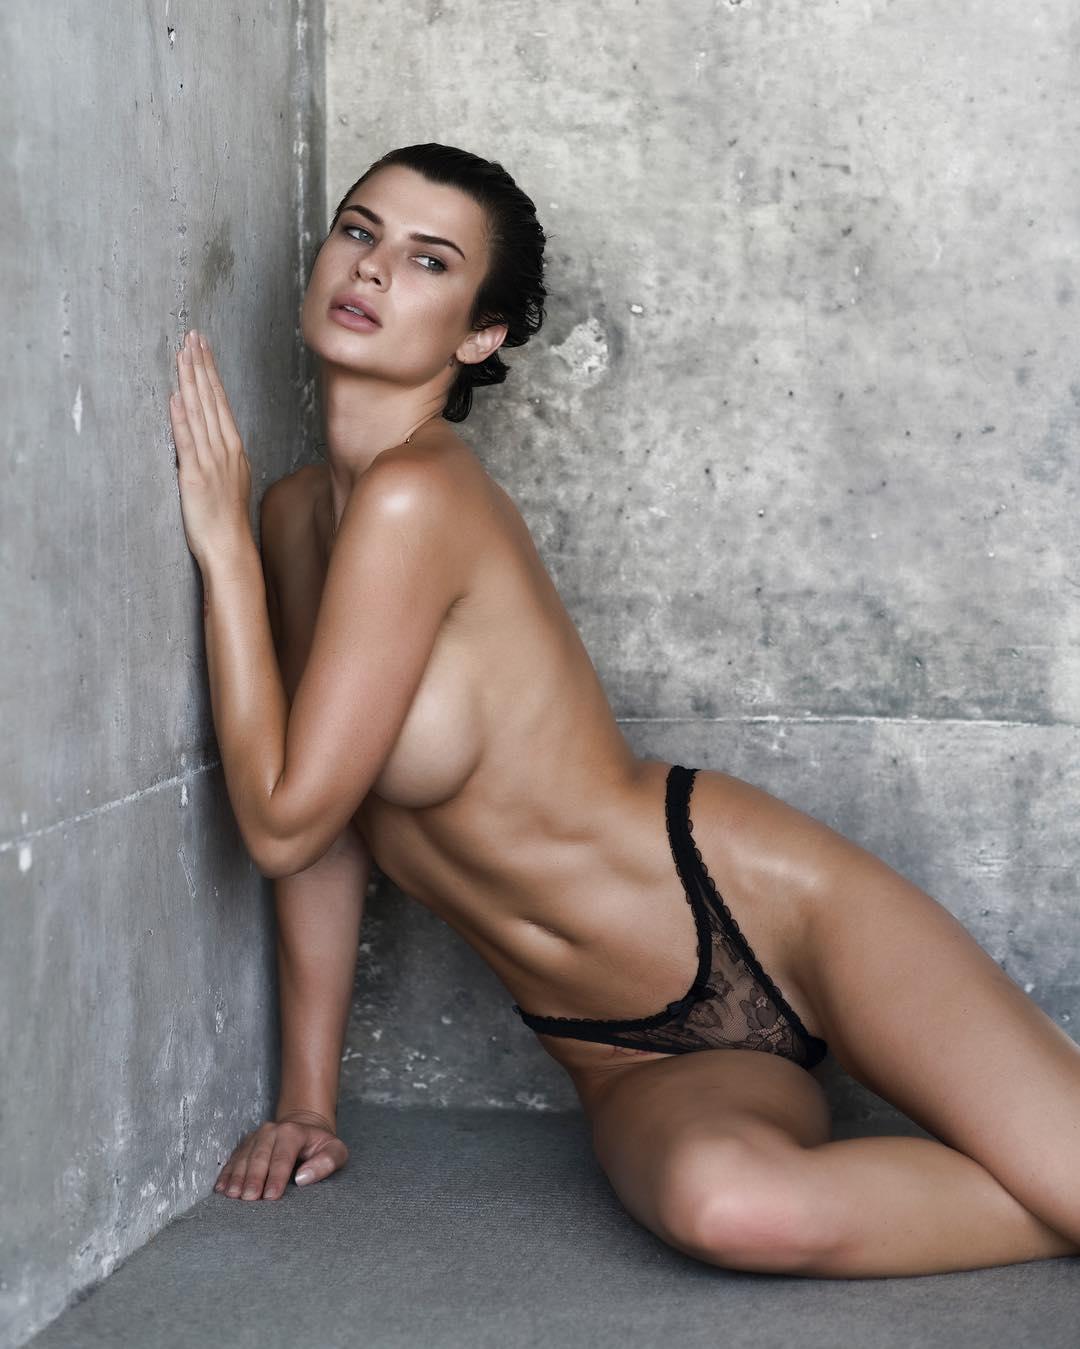 2019 Destiny Sierra nudes (97 foto and video), Sexy, Sideboobs, Instagram, braless 2018